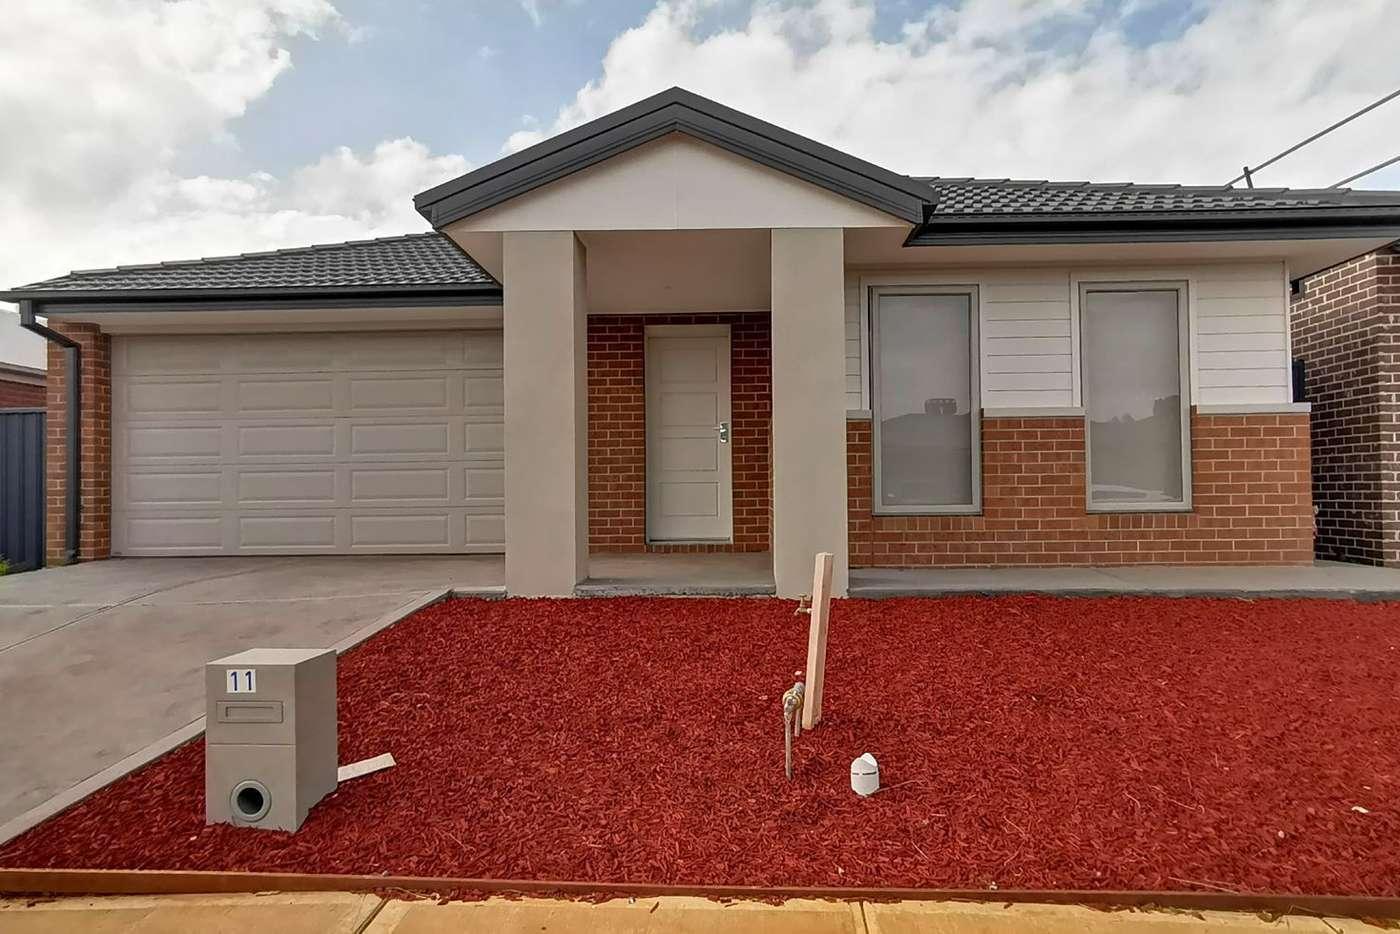 Main view of Homely house listing, 11 Wonnangatta Crescent, Weir Views VIC 3338